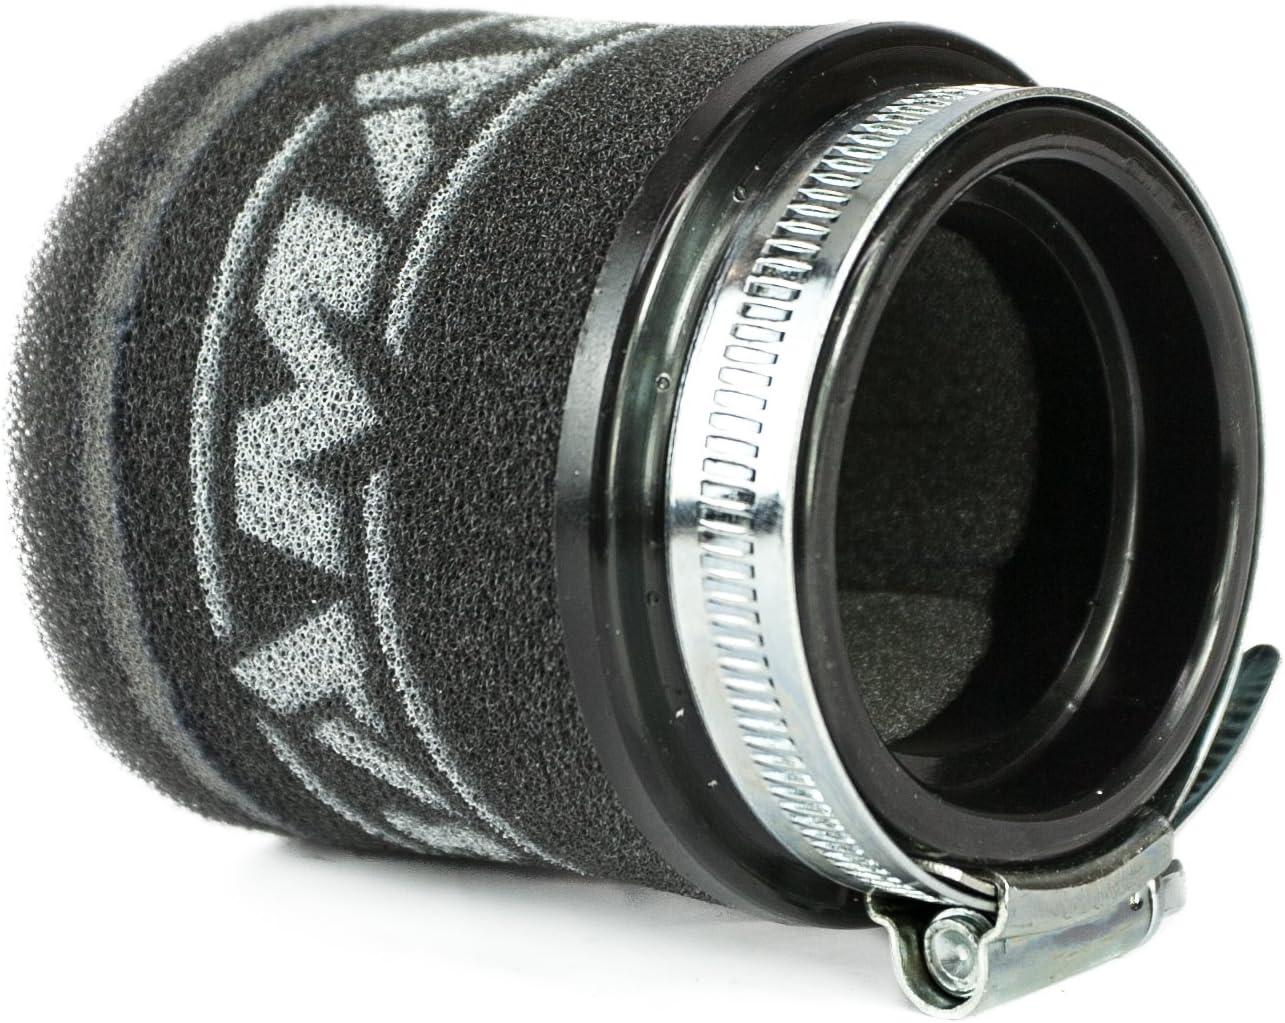 Ramair Filters MR-008 Motorcycle Pod Air Filter, Black, 55 mm